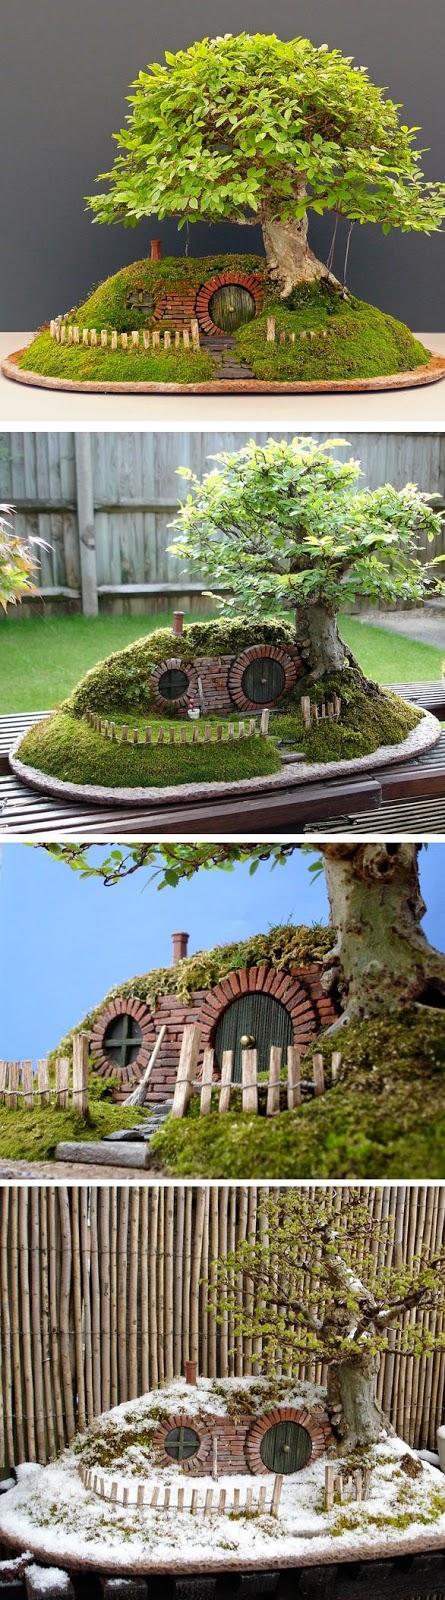 mini jardim ou mini jardim:Ambiente Bariri: Mini Jardim ou Fairy Garden